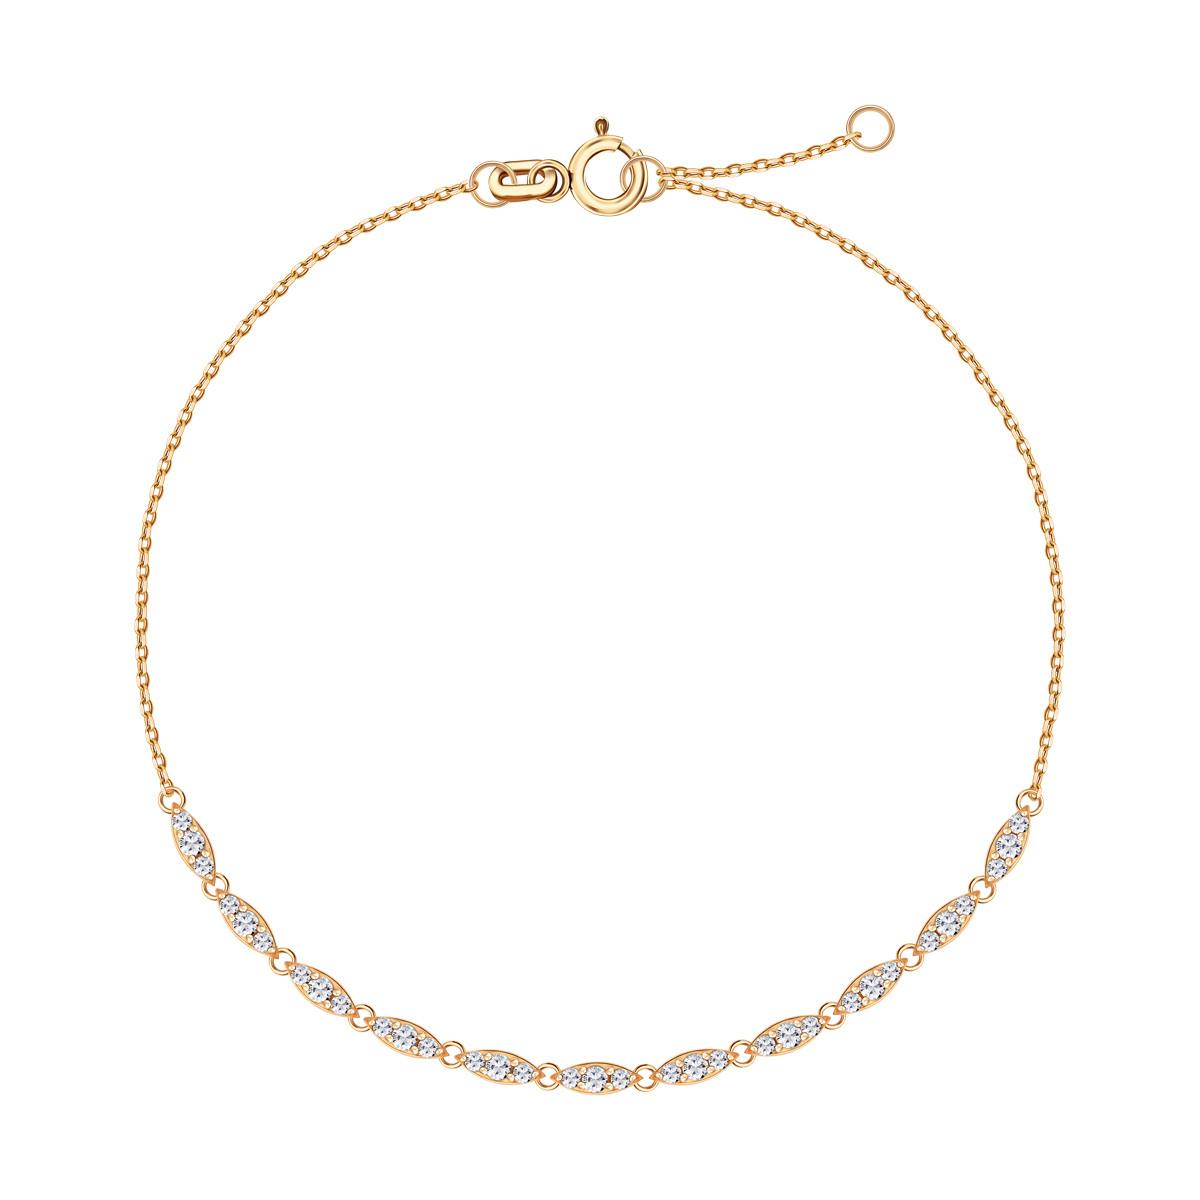 3c9ff4ac7d9159 Lunaria - złota bransoletka z cyrkoniami (DB16691 - 35625)